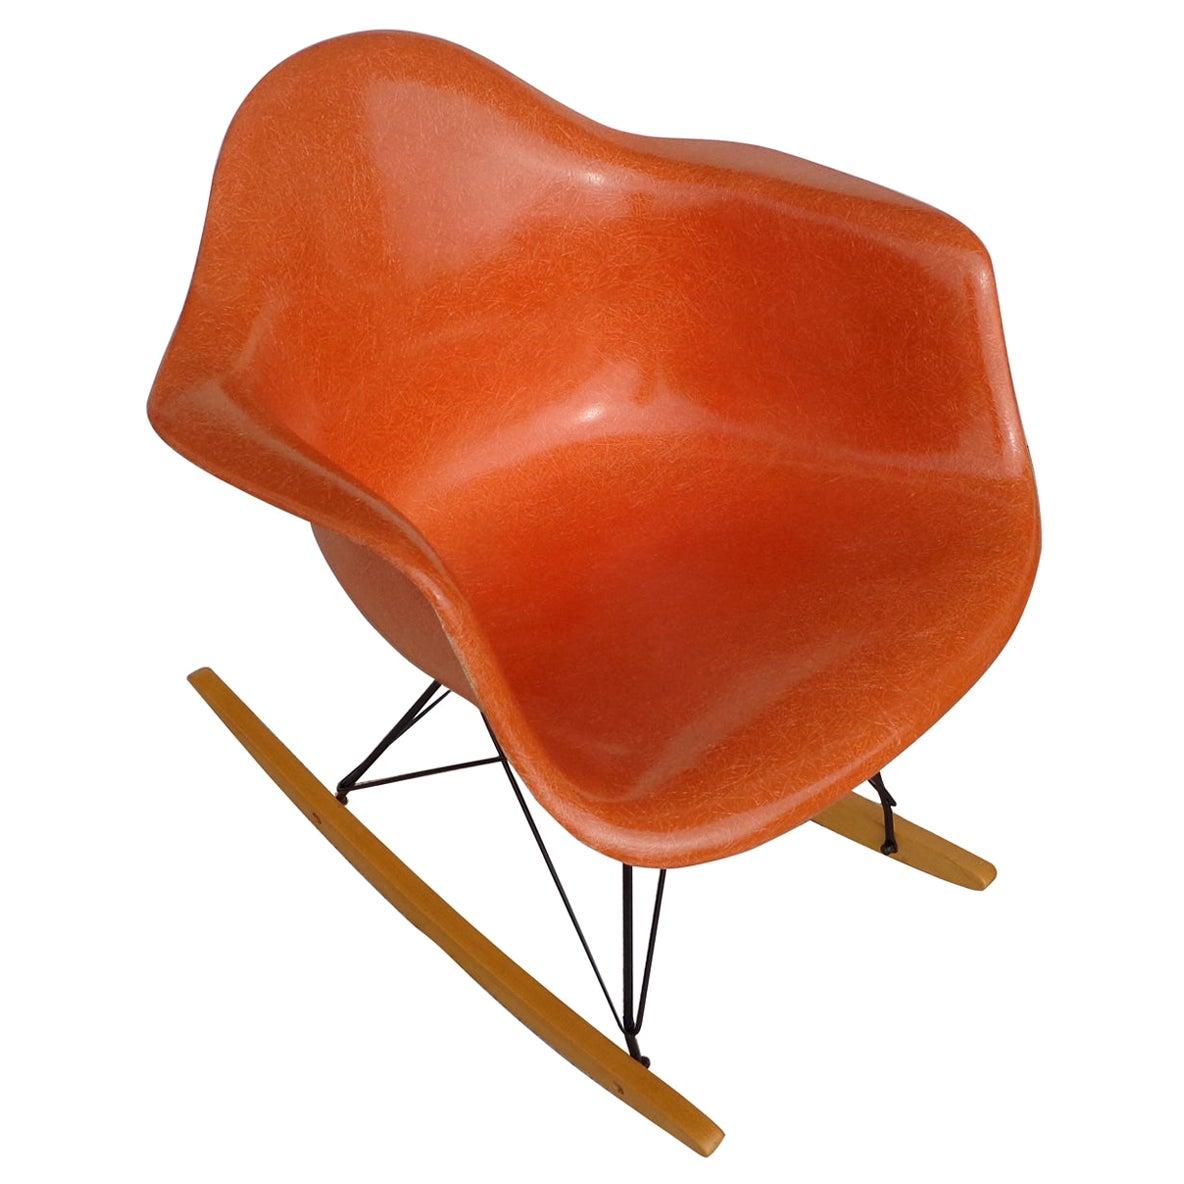 1 Herman Miller Orange Shell Fiberglass RAR Rocker by Eames